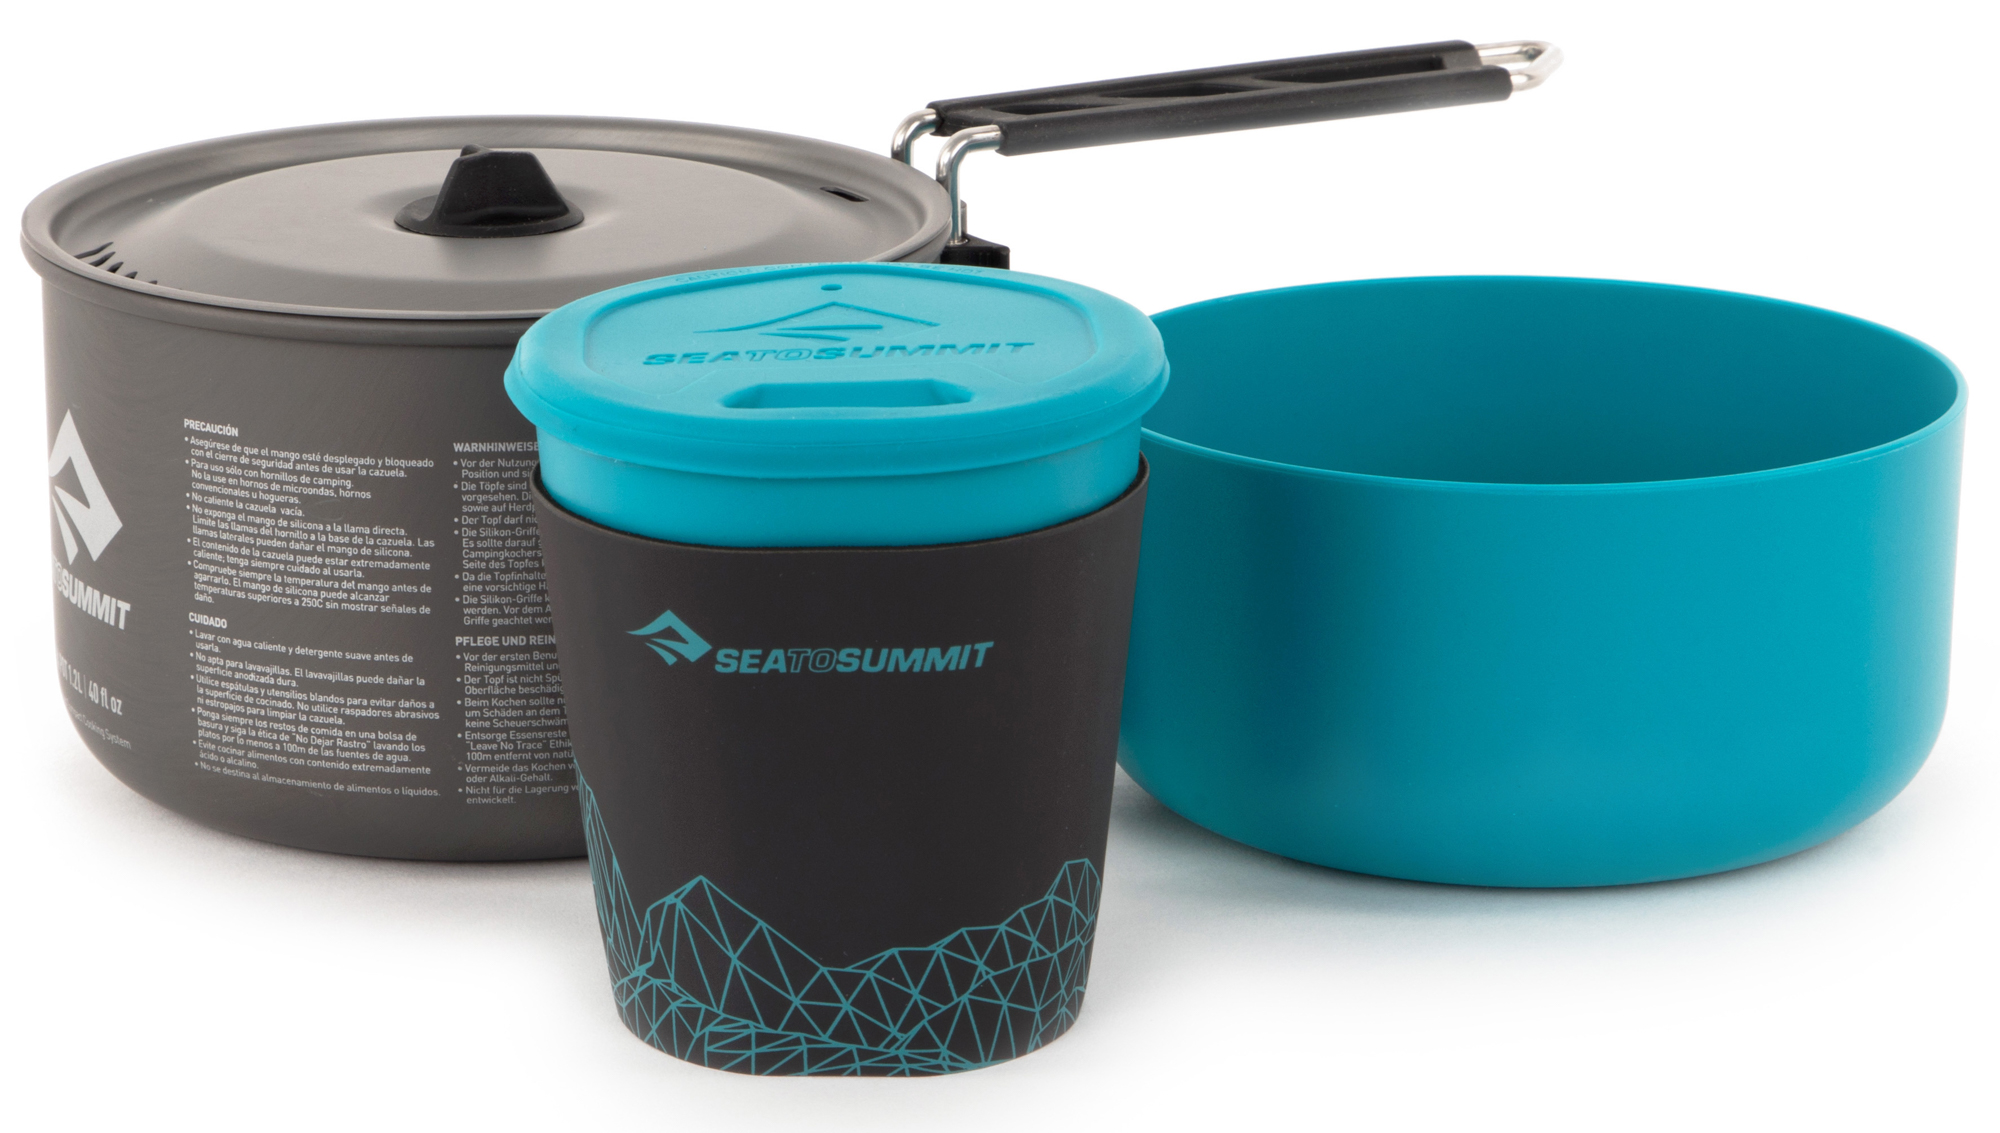 SEA TO SUMMIT Набор посуды SEA TO SUMMIT Alpha 2 Pot Cook Set 1.1 комплектующие для спортивных сумок sea to summit 56928afrb25spp 2015 afrb25srpp